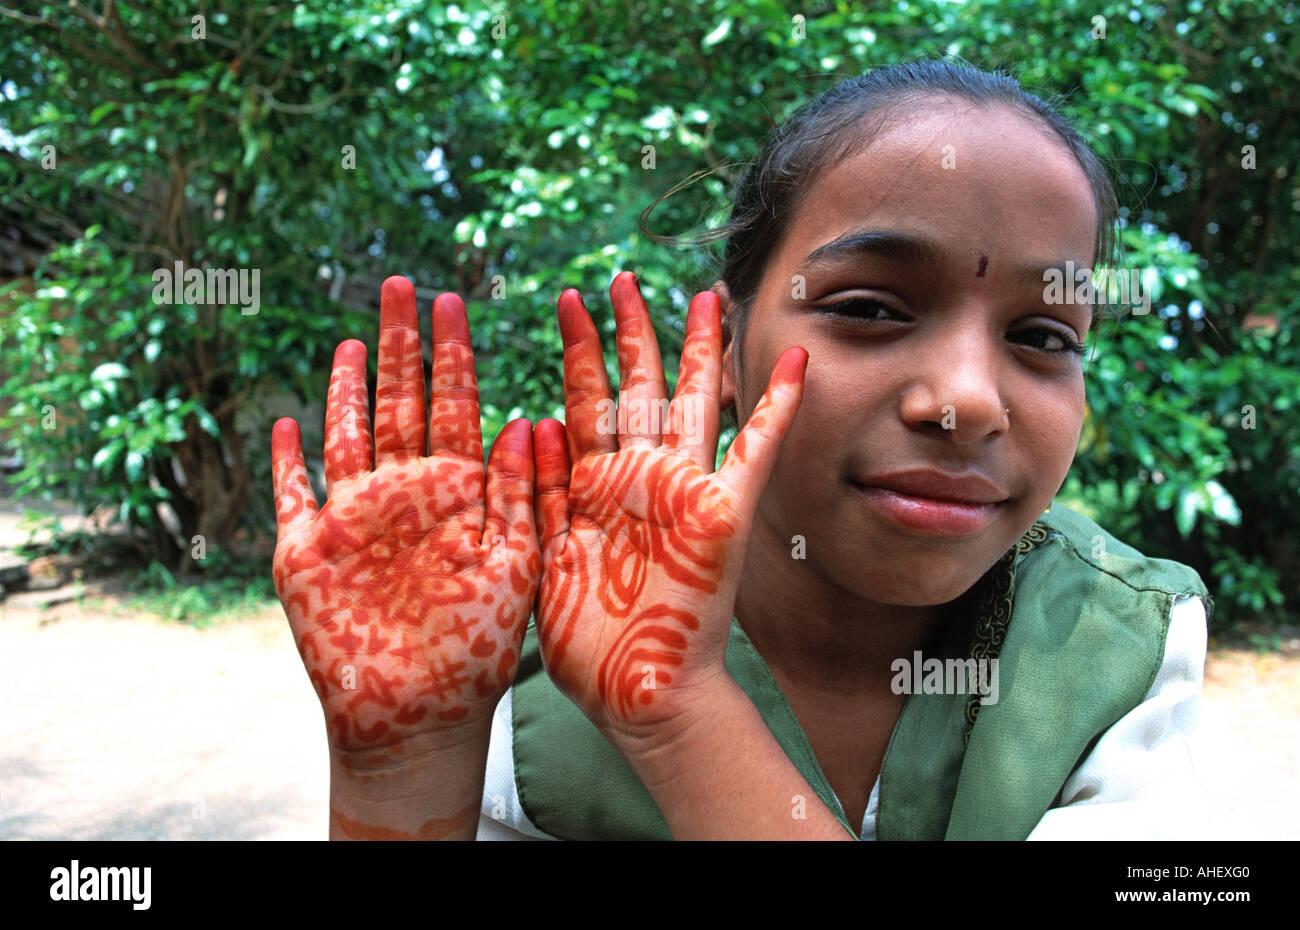 Indian girl with henna painted hands Khajuraho Madhya Pradesh India - Stock Image